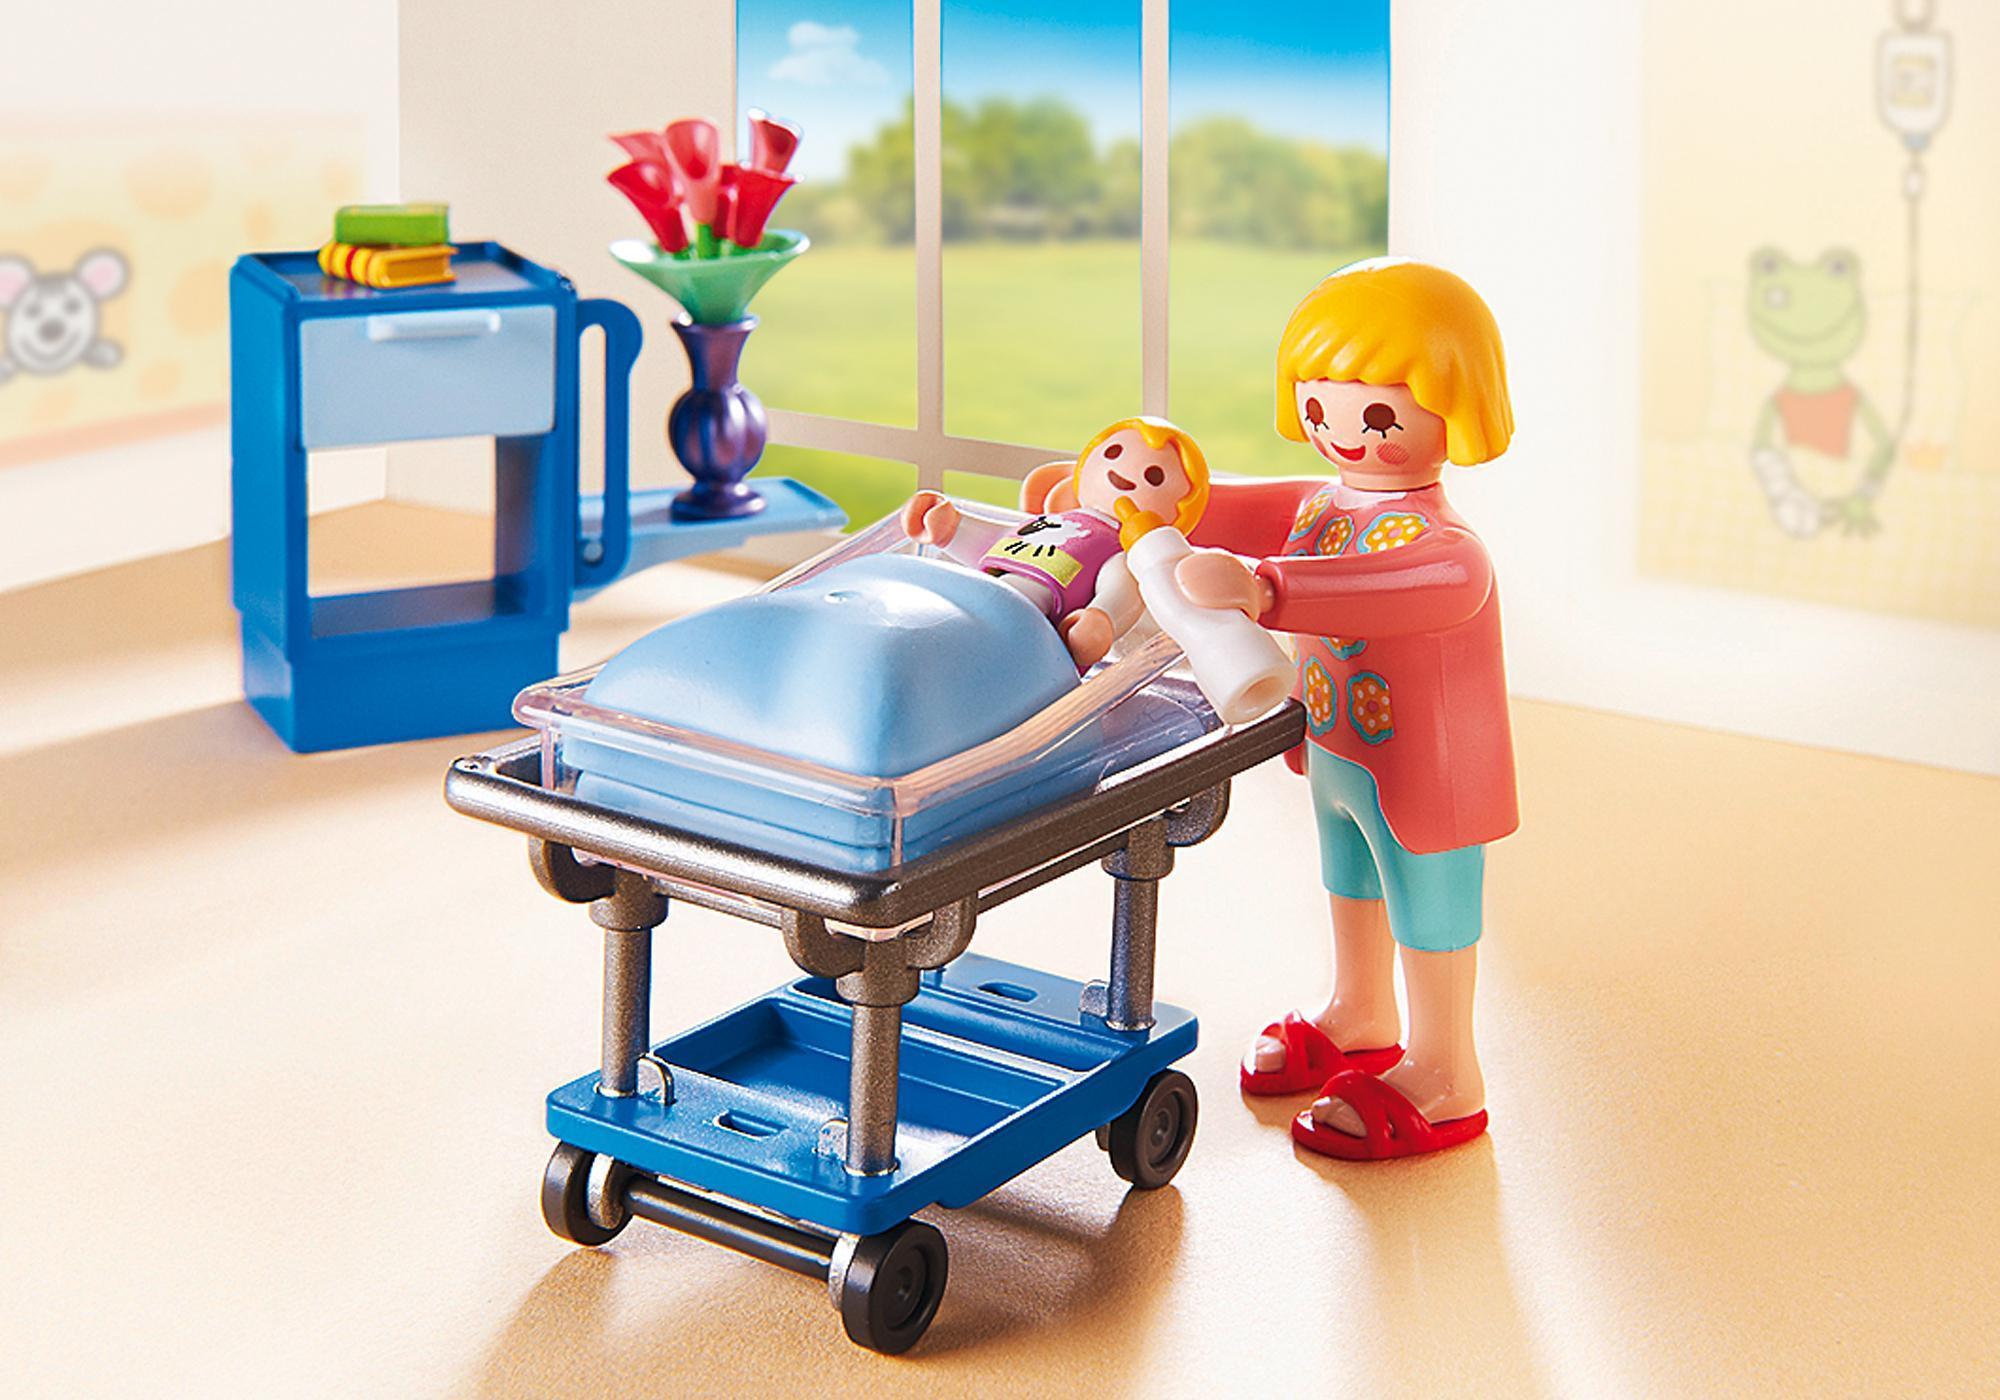 http://media.playmobil.com/i/playmobil/6660_product_extra1/Sala de Maternidad